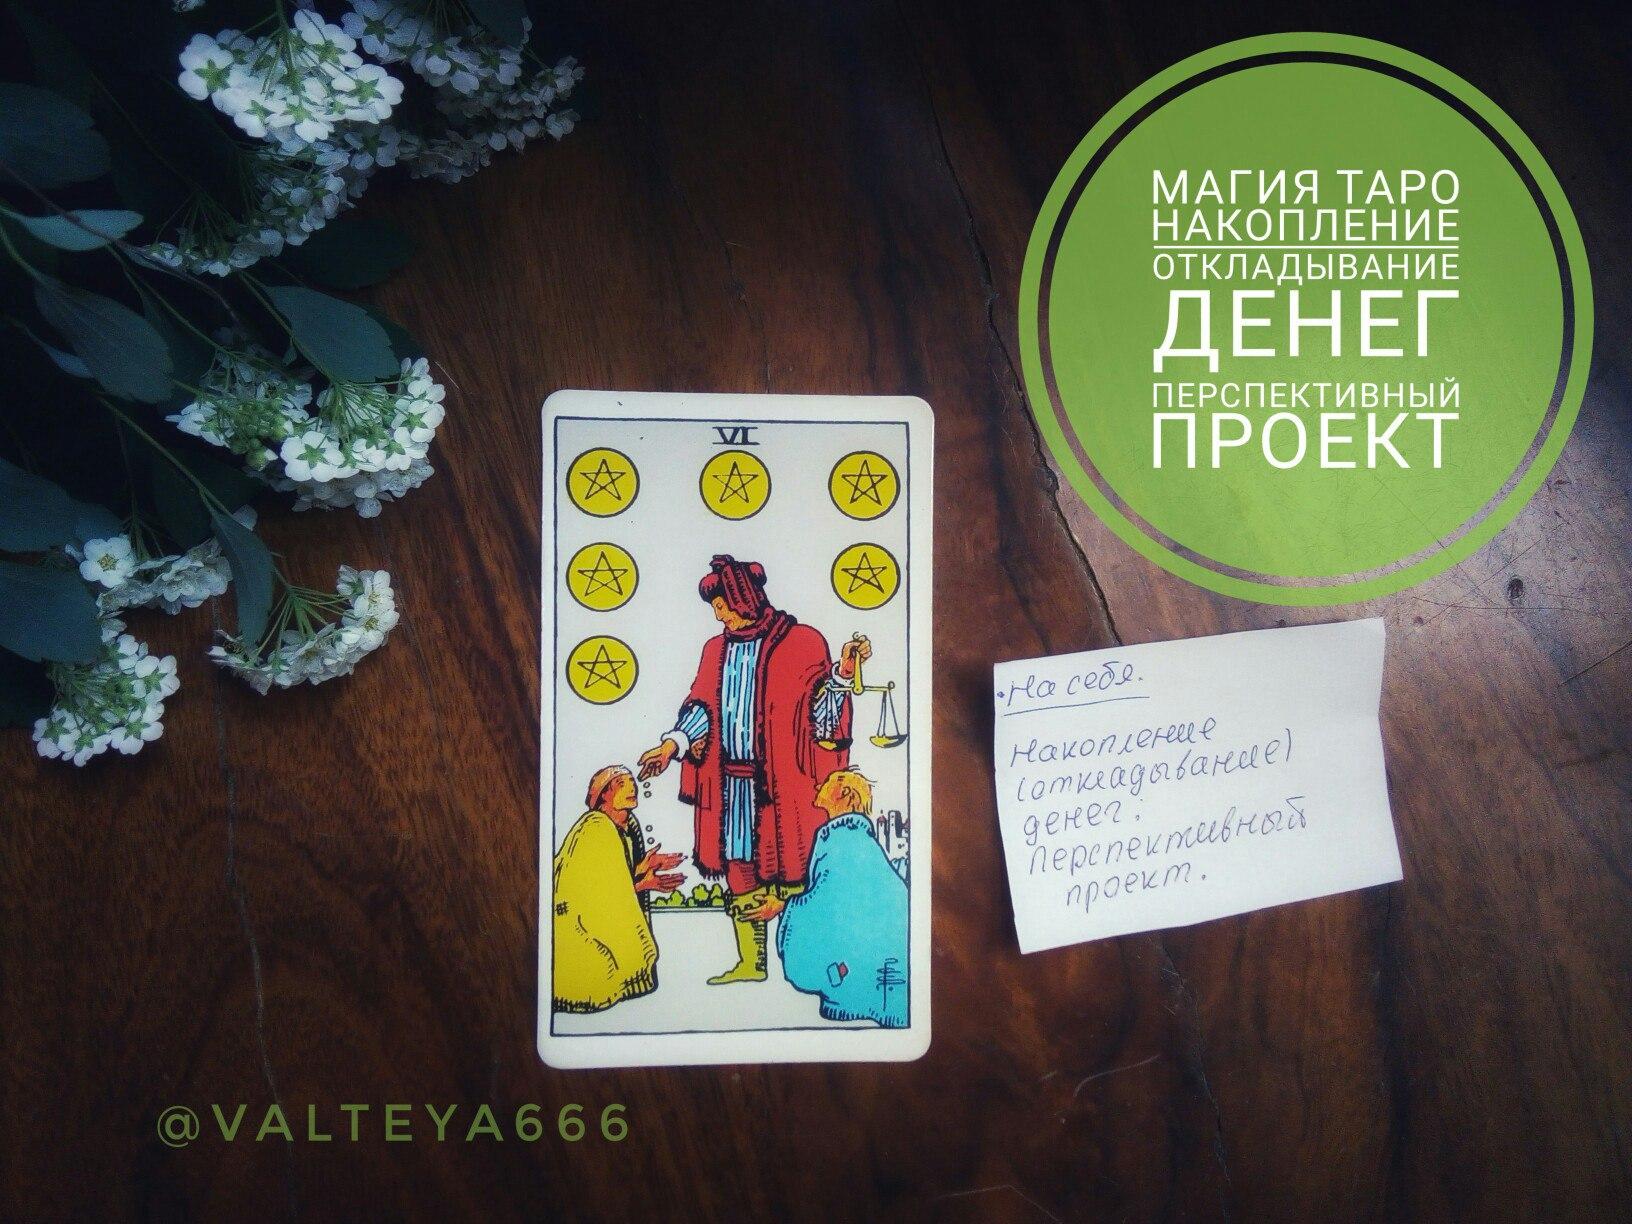 Хештег таро на   Салон Магии и мистики Елены Руденко ( Валтеи ). Киев ,тел: 0506251562  Pt3WQc8fkbM